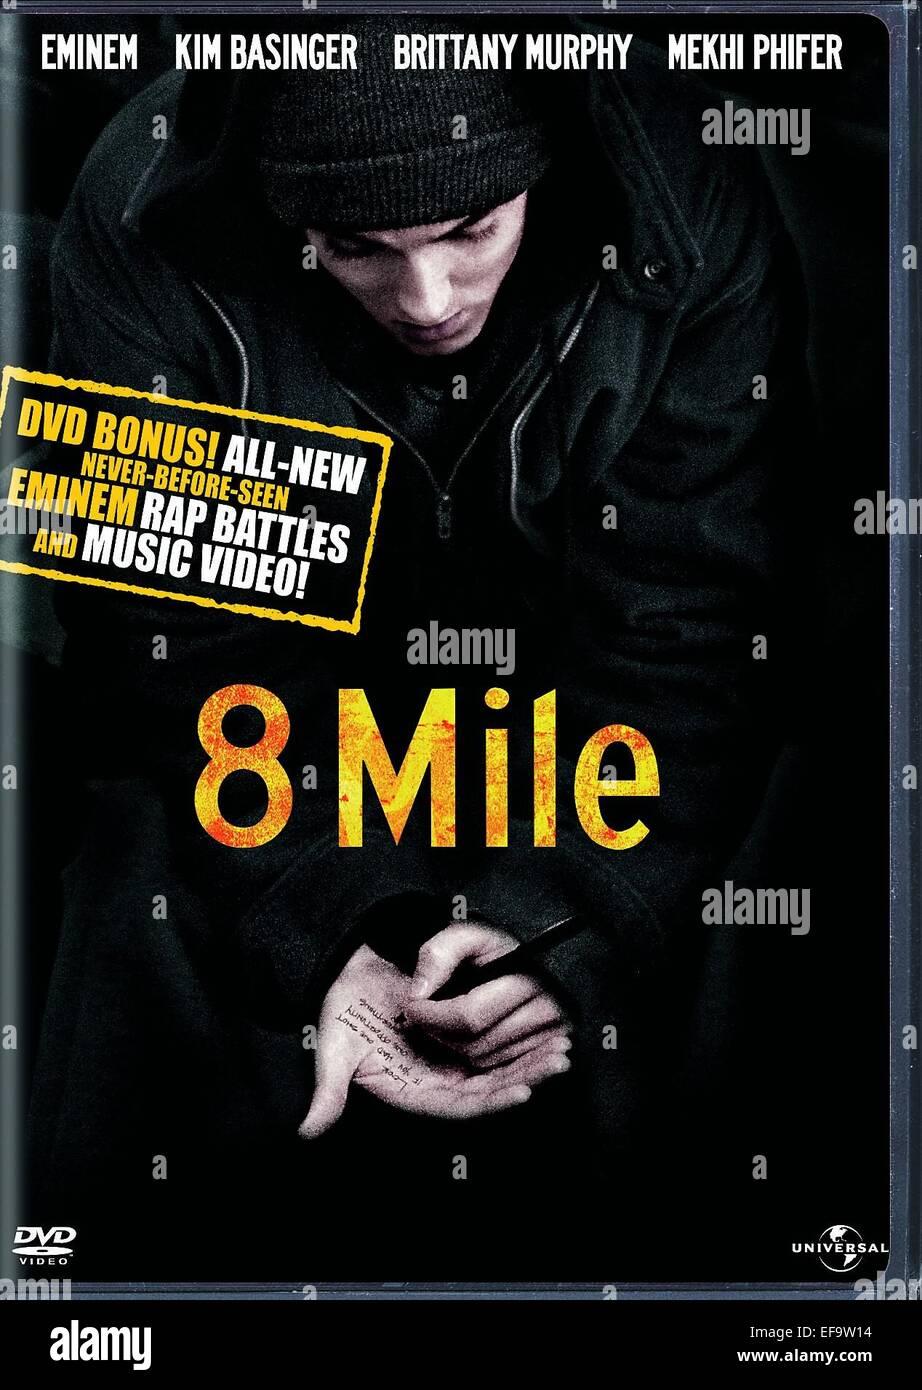 Eminem Poster 8 Mile 2002 Stock Photo Alamy